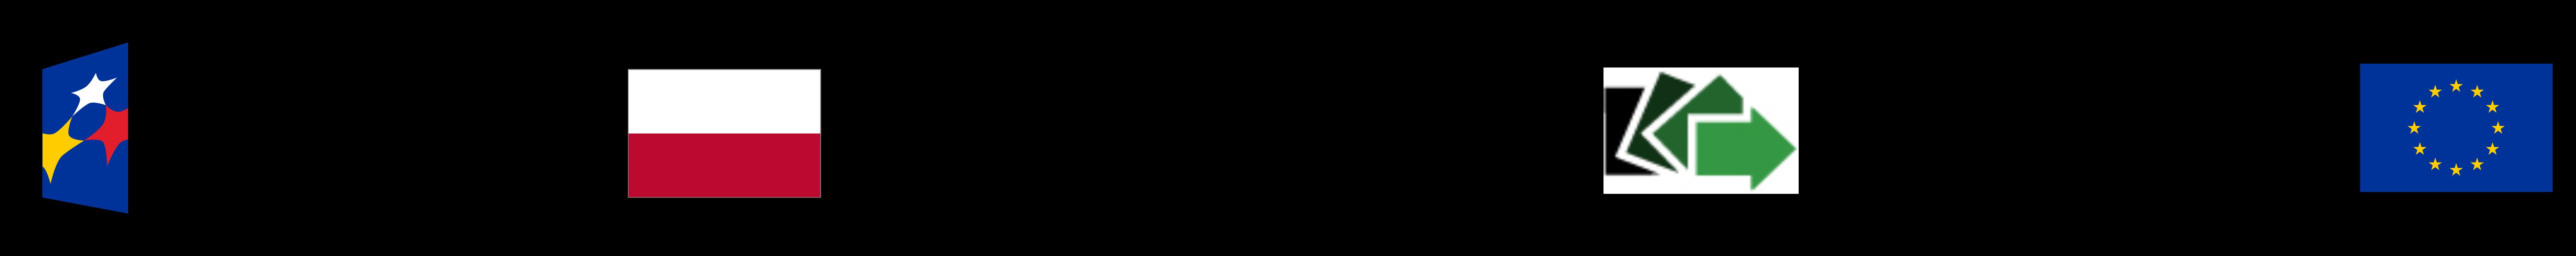 power loga